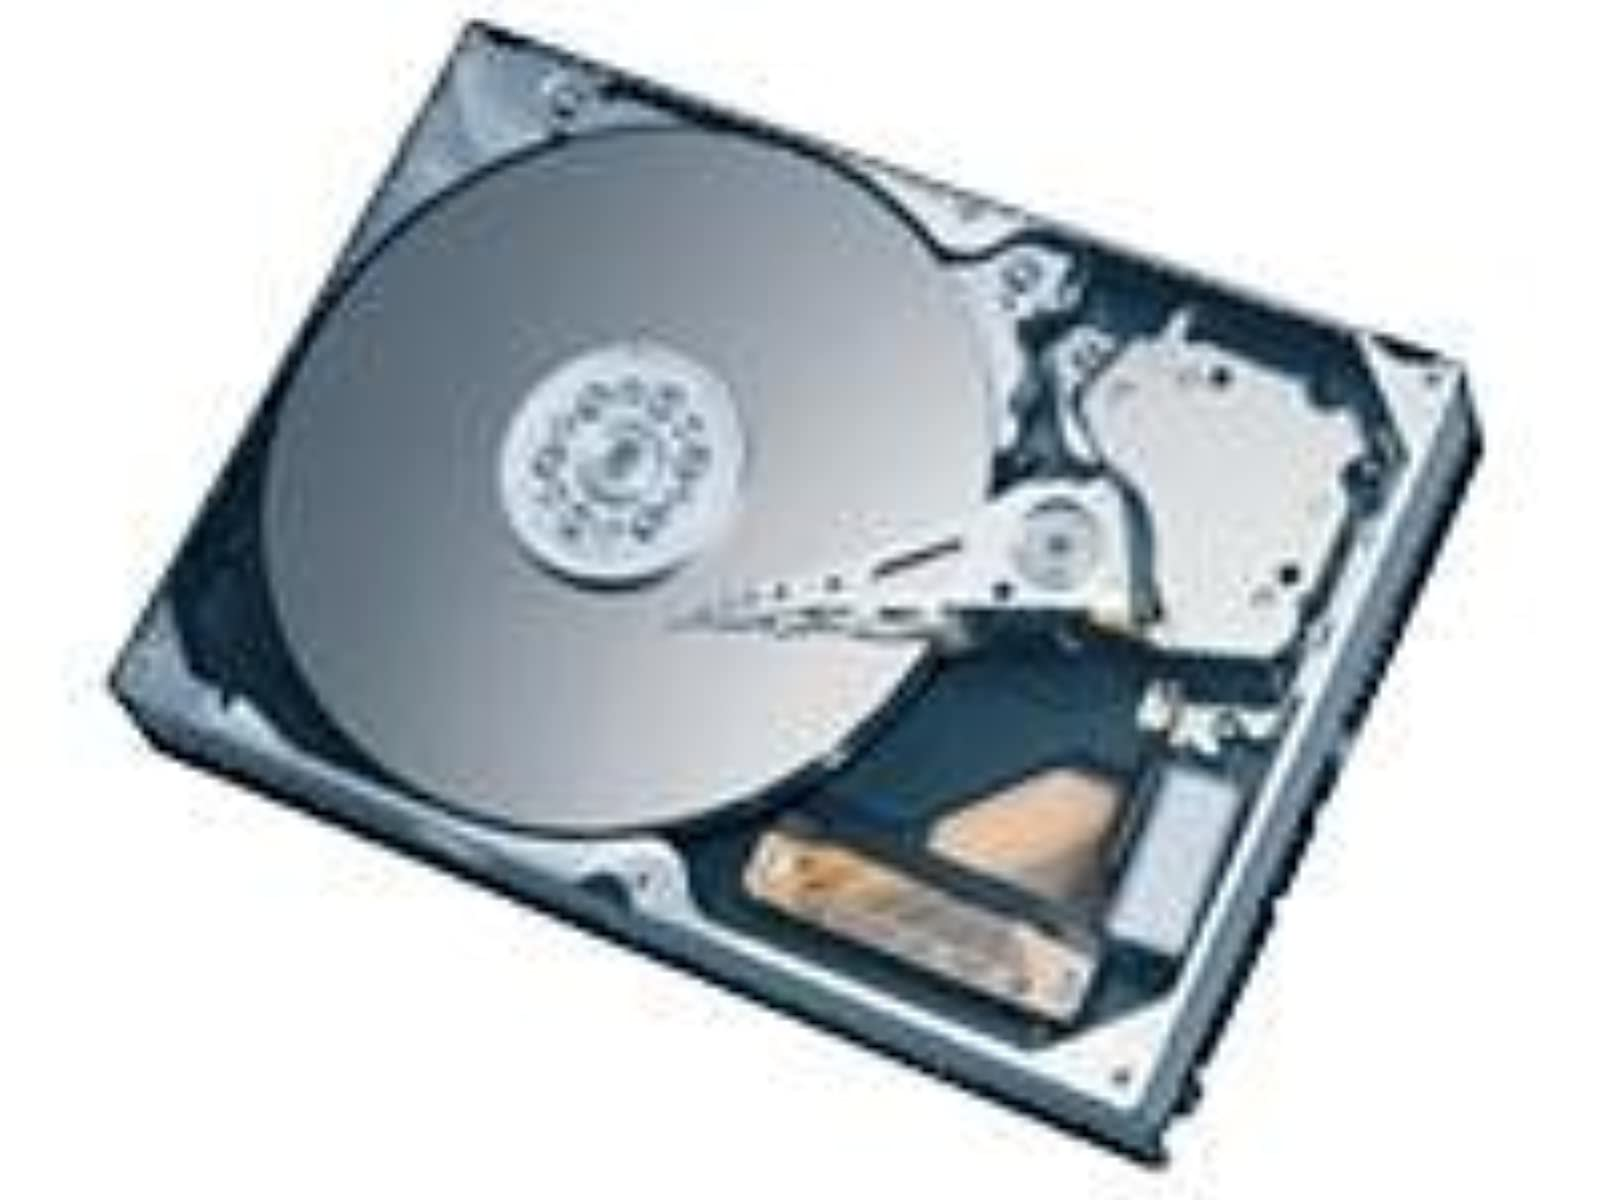 6Y160M0 160GB Maxtor Diamondmax Plus 9 Hard Drive 6Y160M0